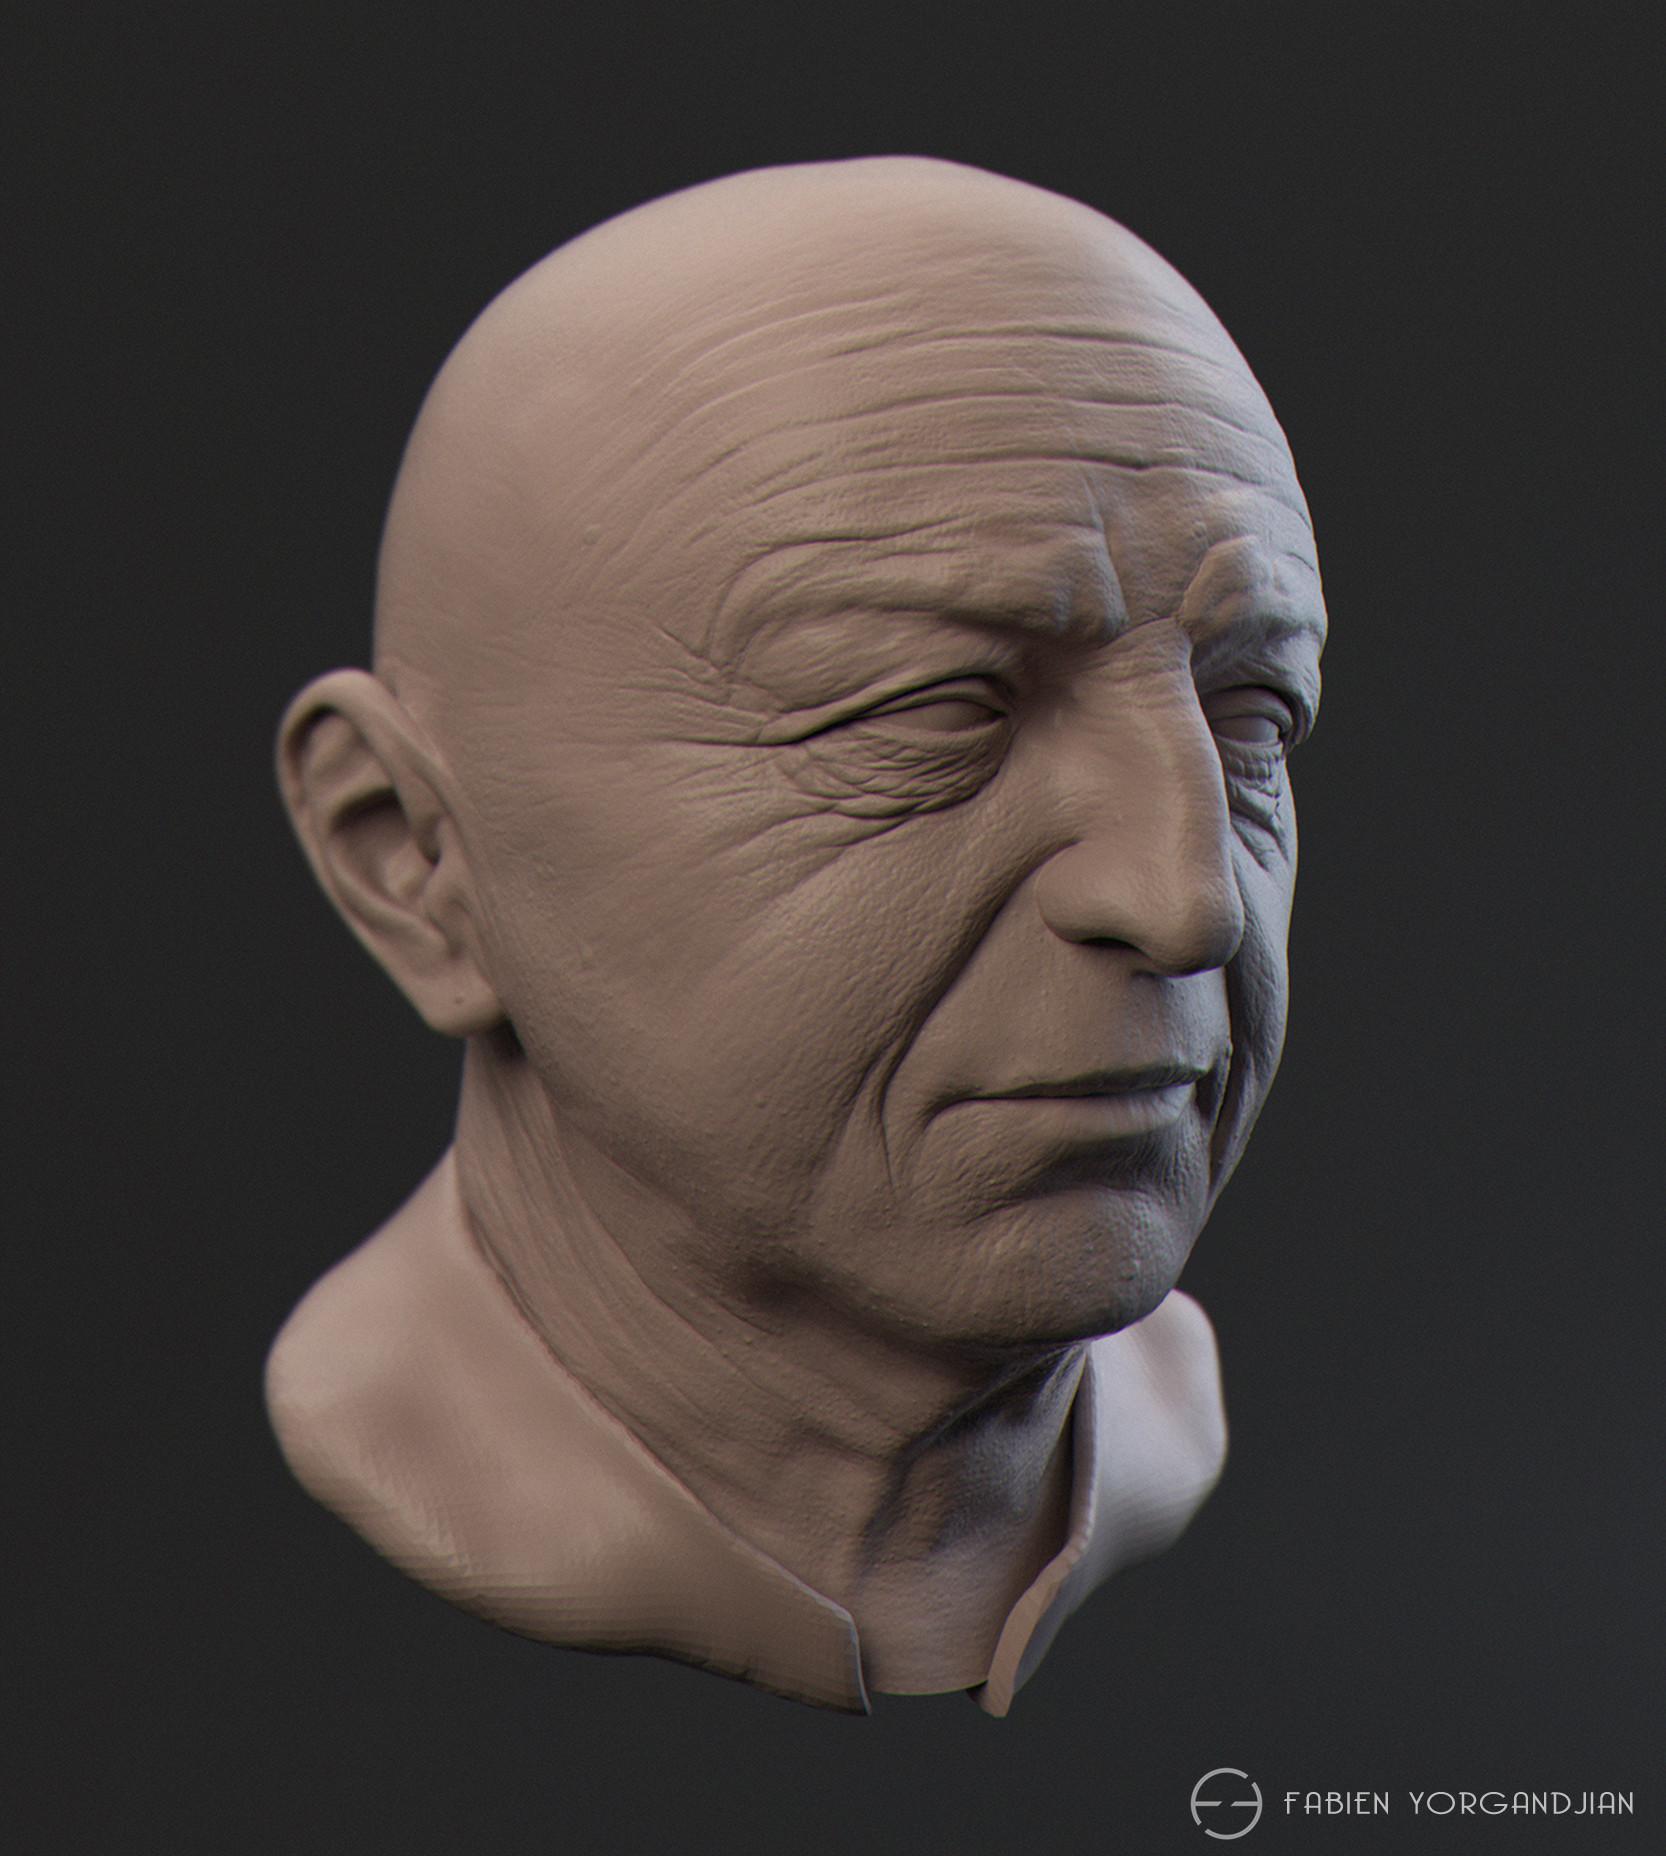 Fabien yorgandjian head 06 03